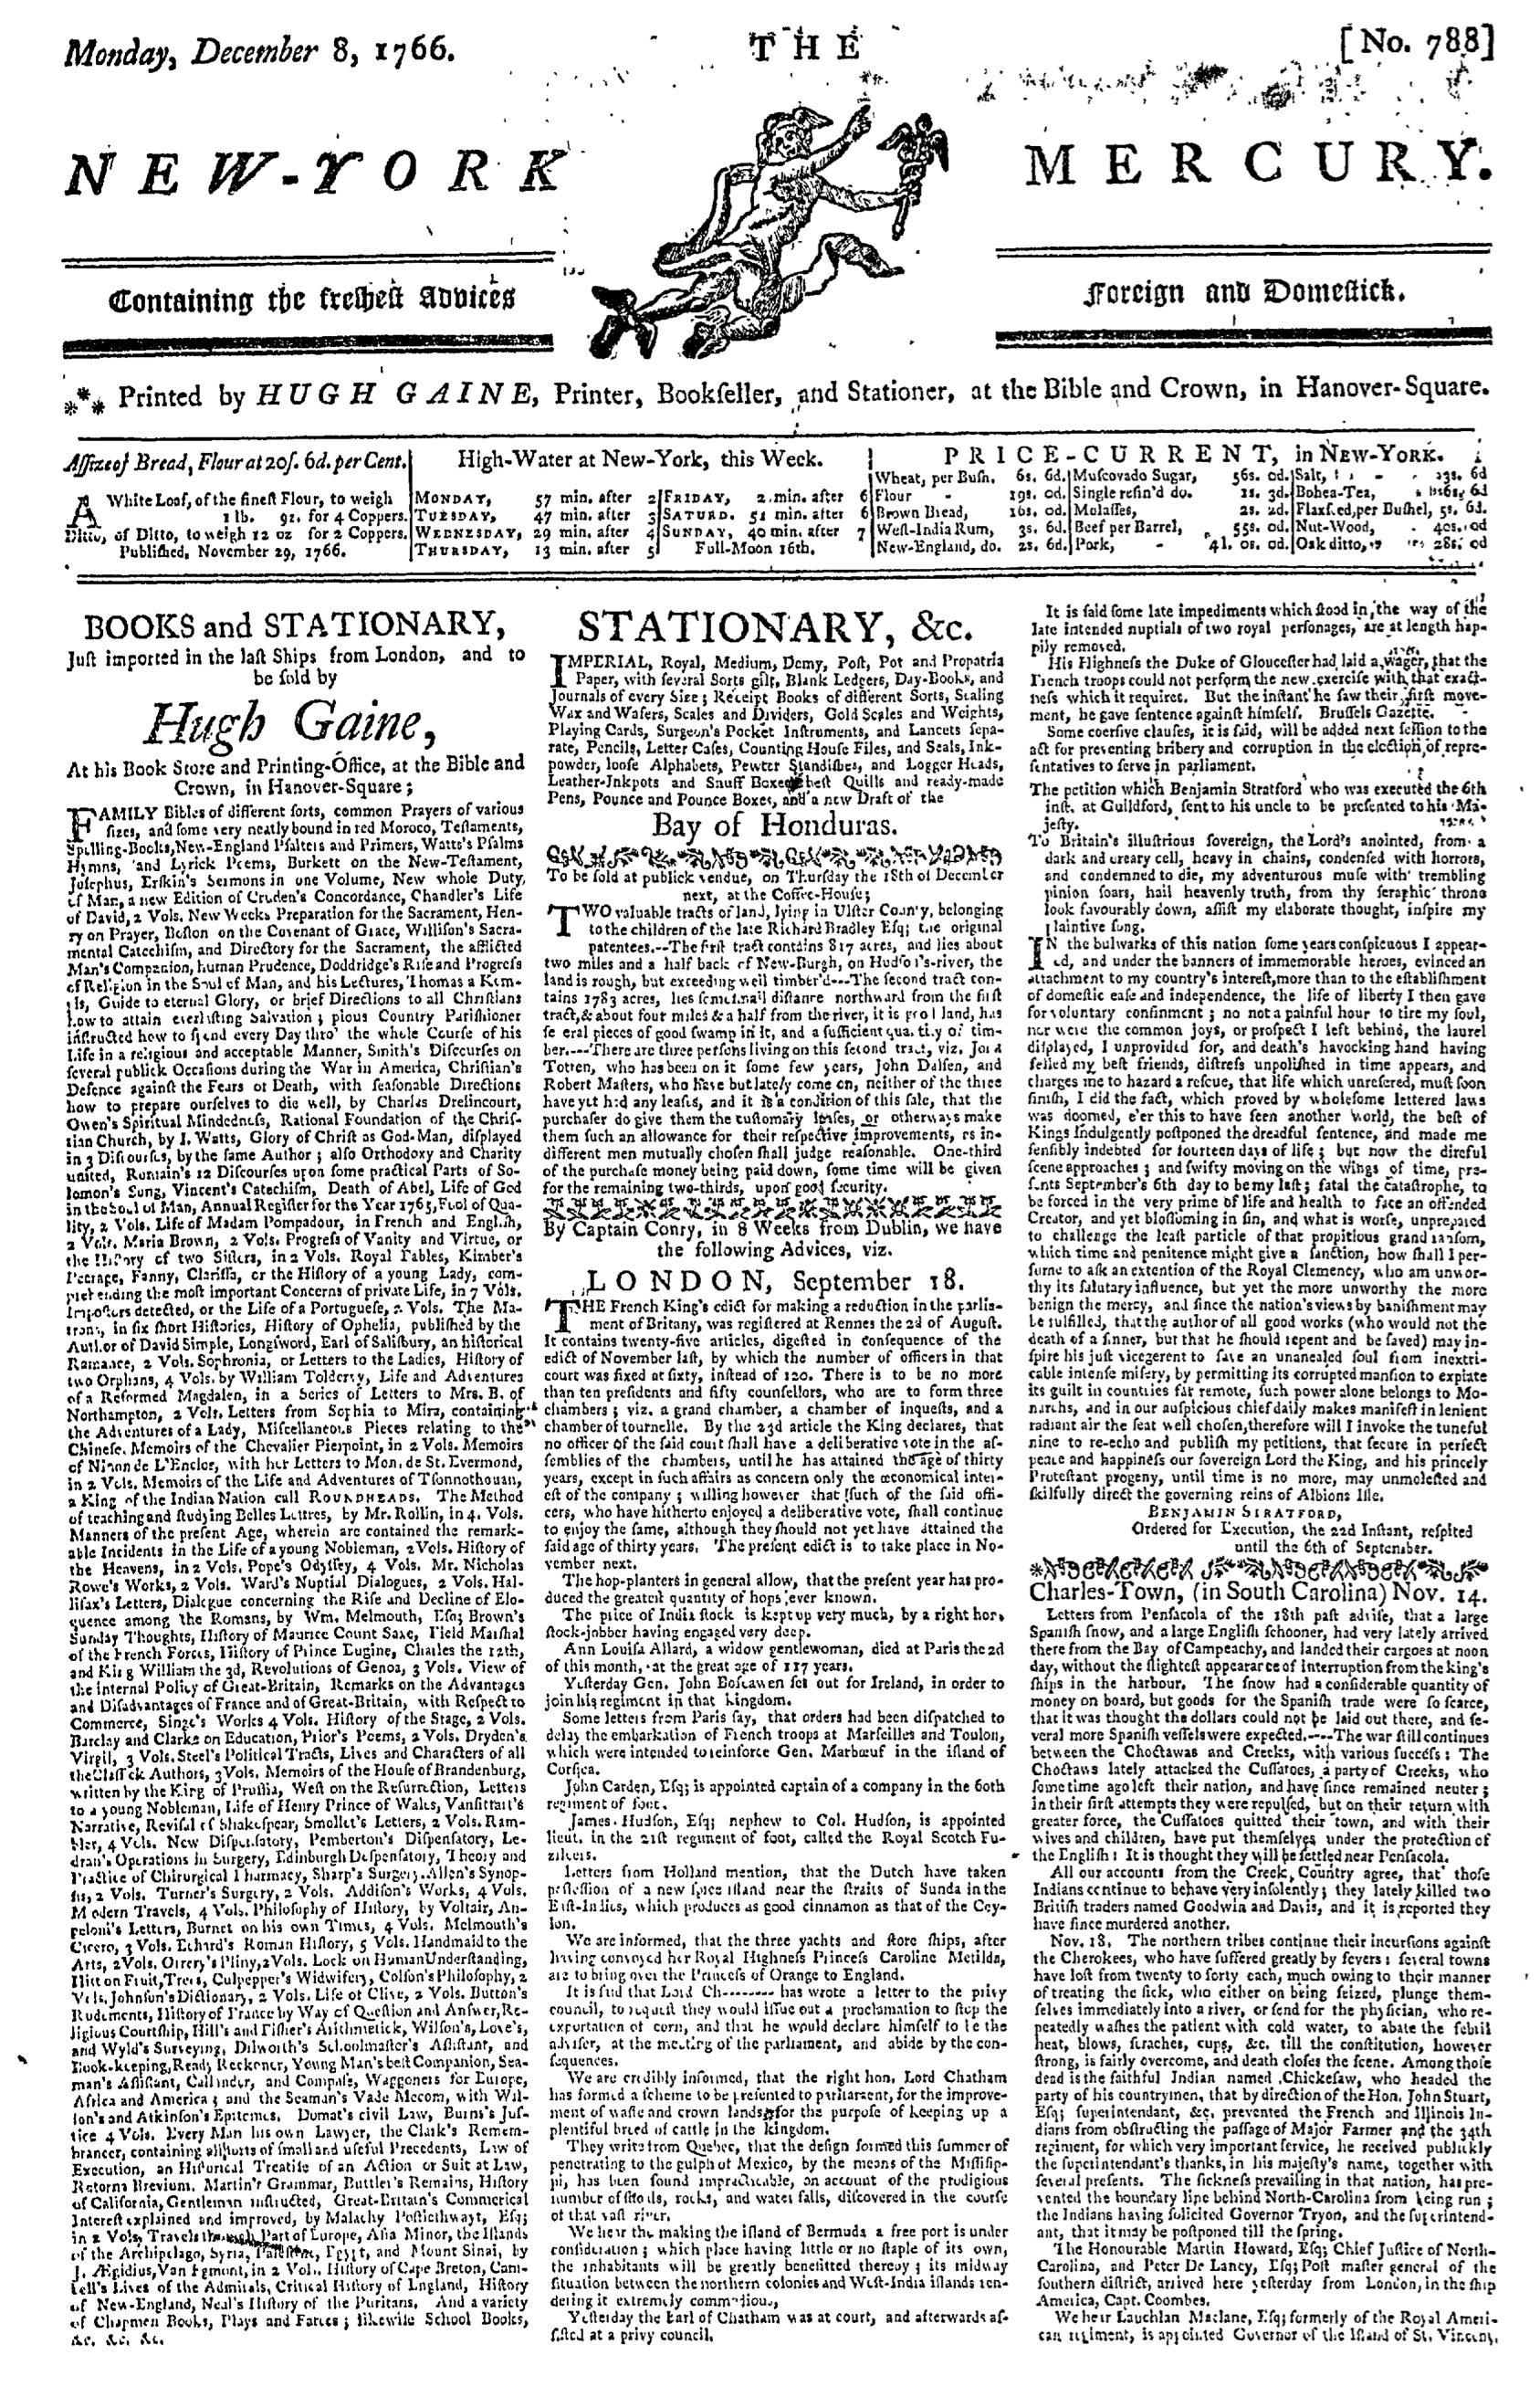 dec-8-1281766-first-page-new-york-mercury